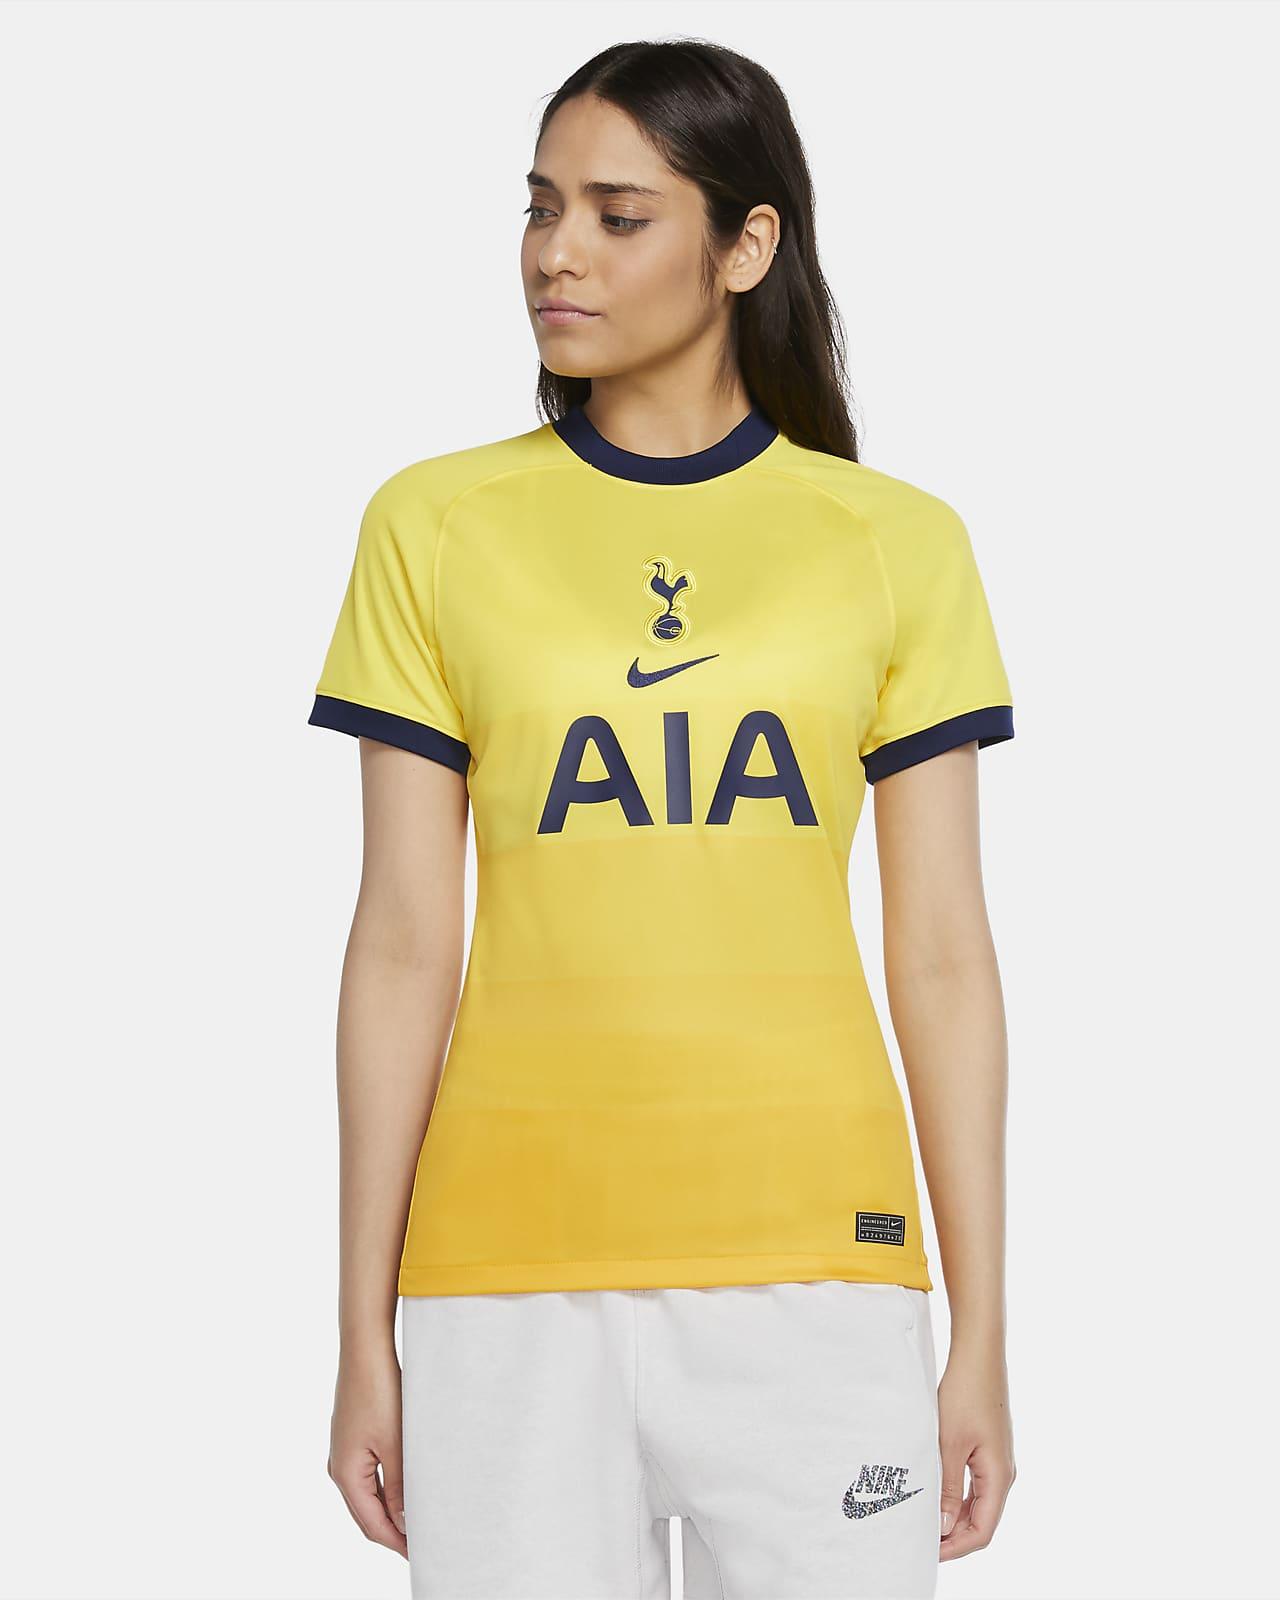 3e maillot de football Tottenham Hotspur 2020/21 Stadium pour Femme